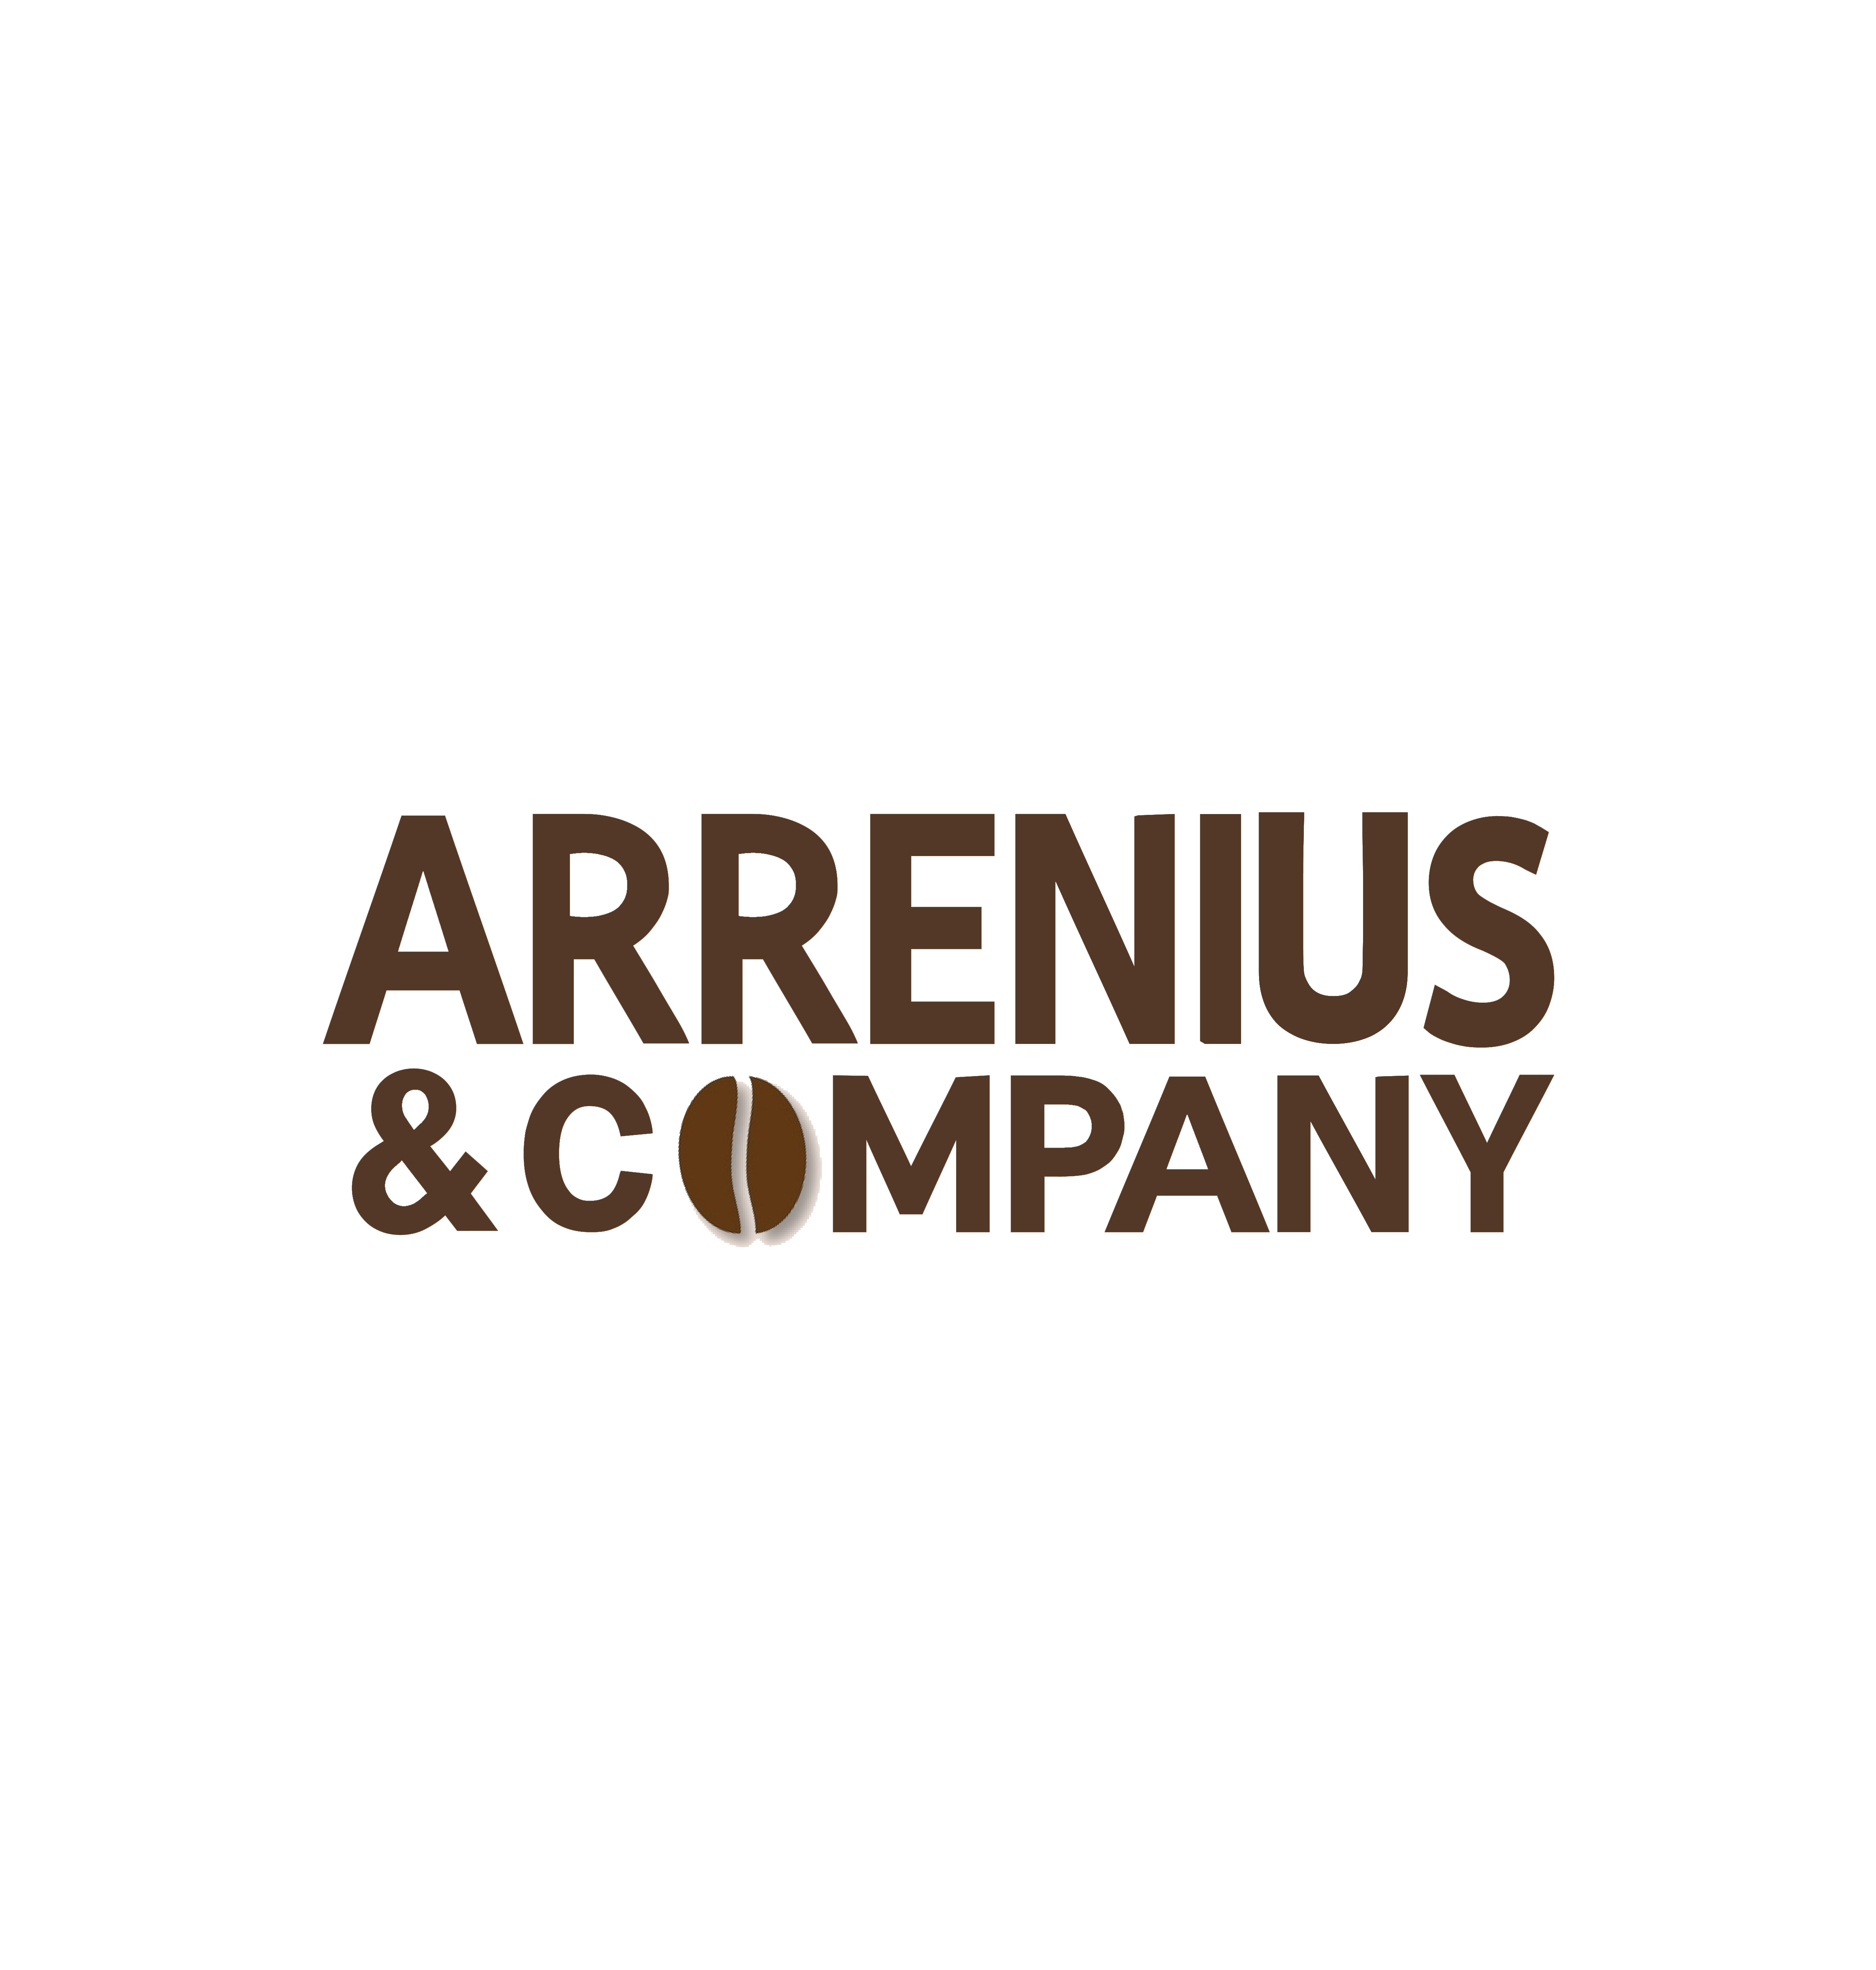 Arrenius & company